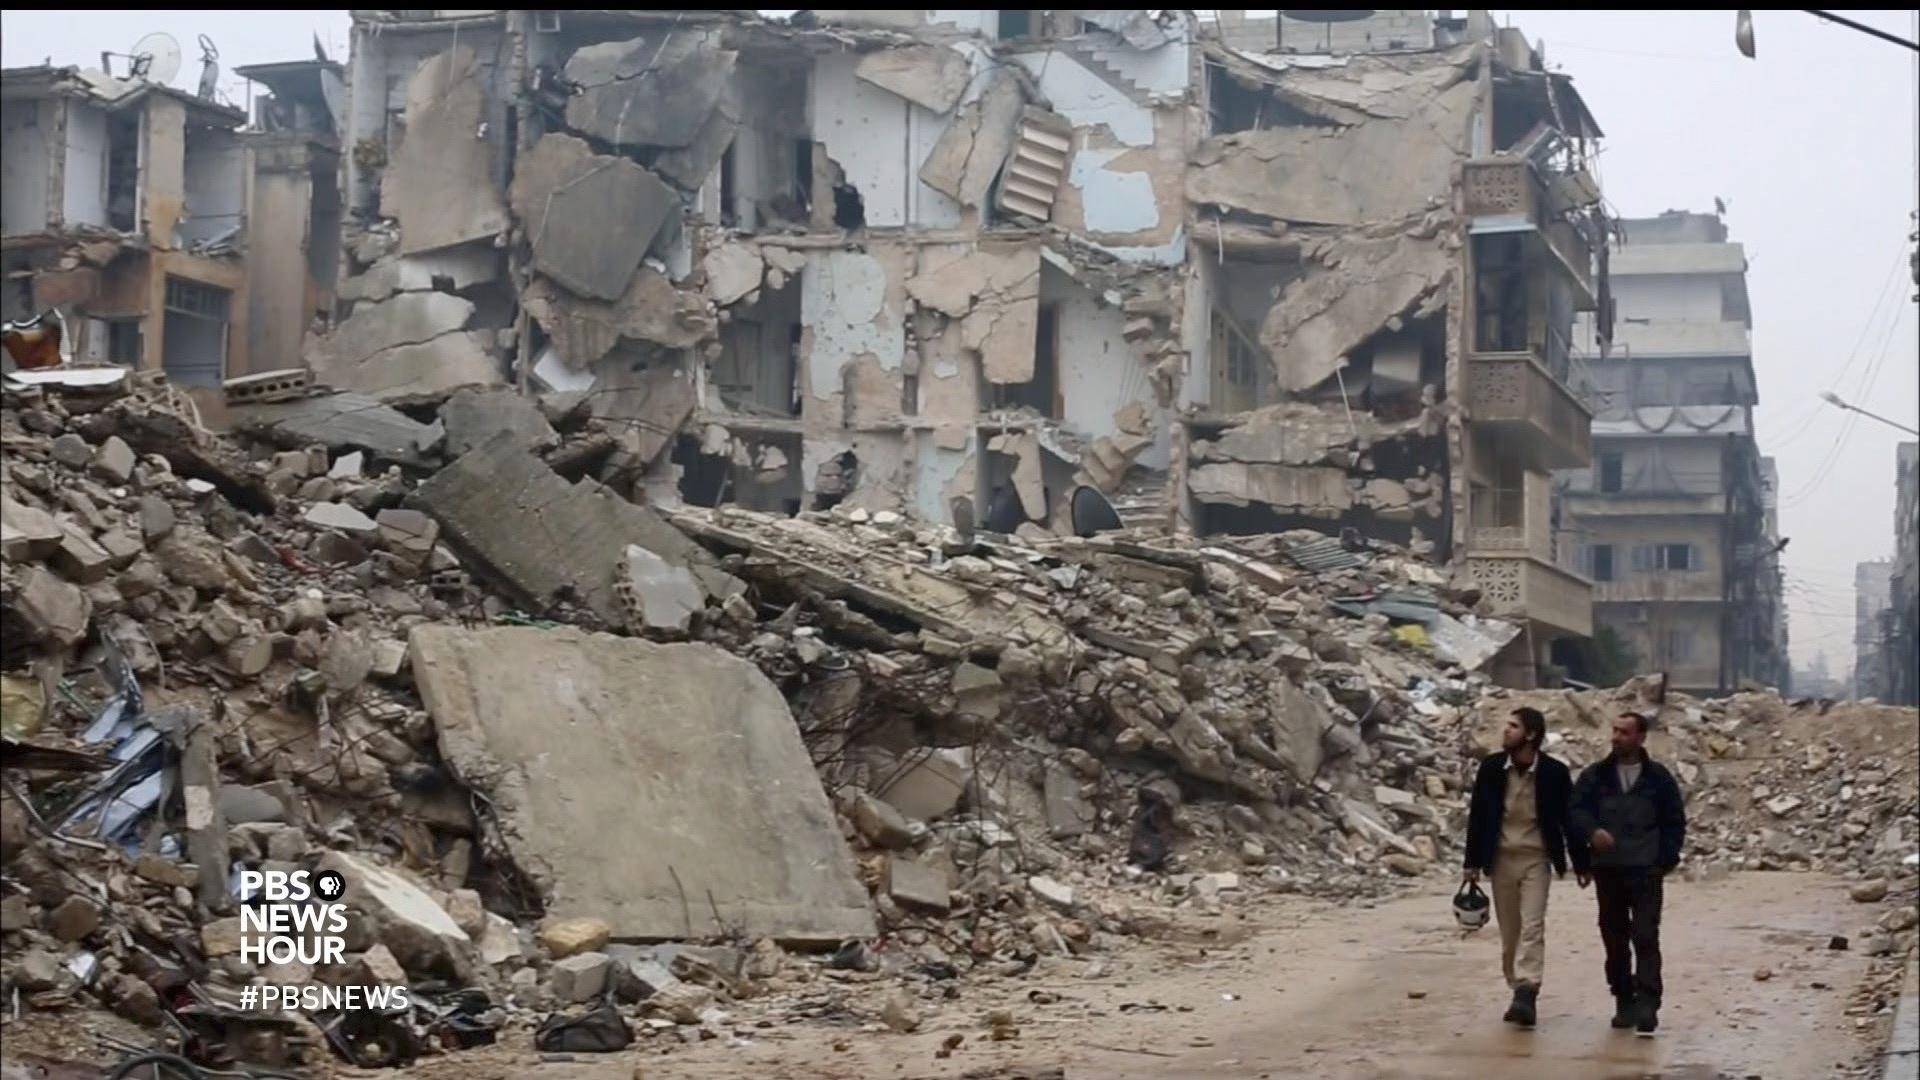 'The White Helmets' offer moments of hope amid devastation